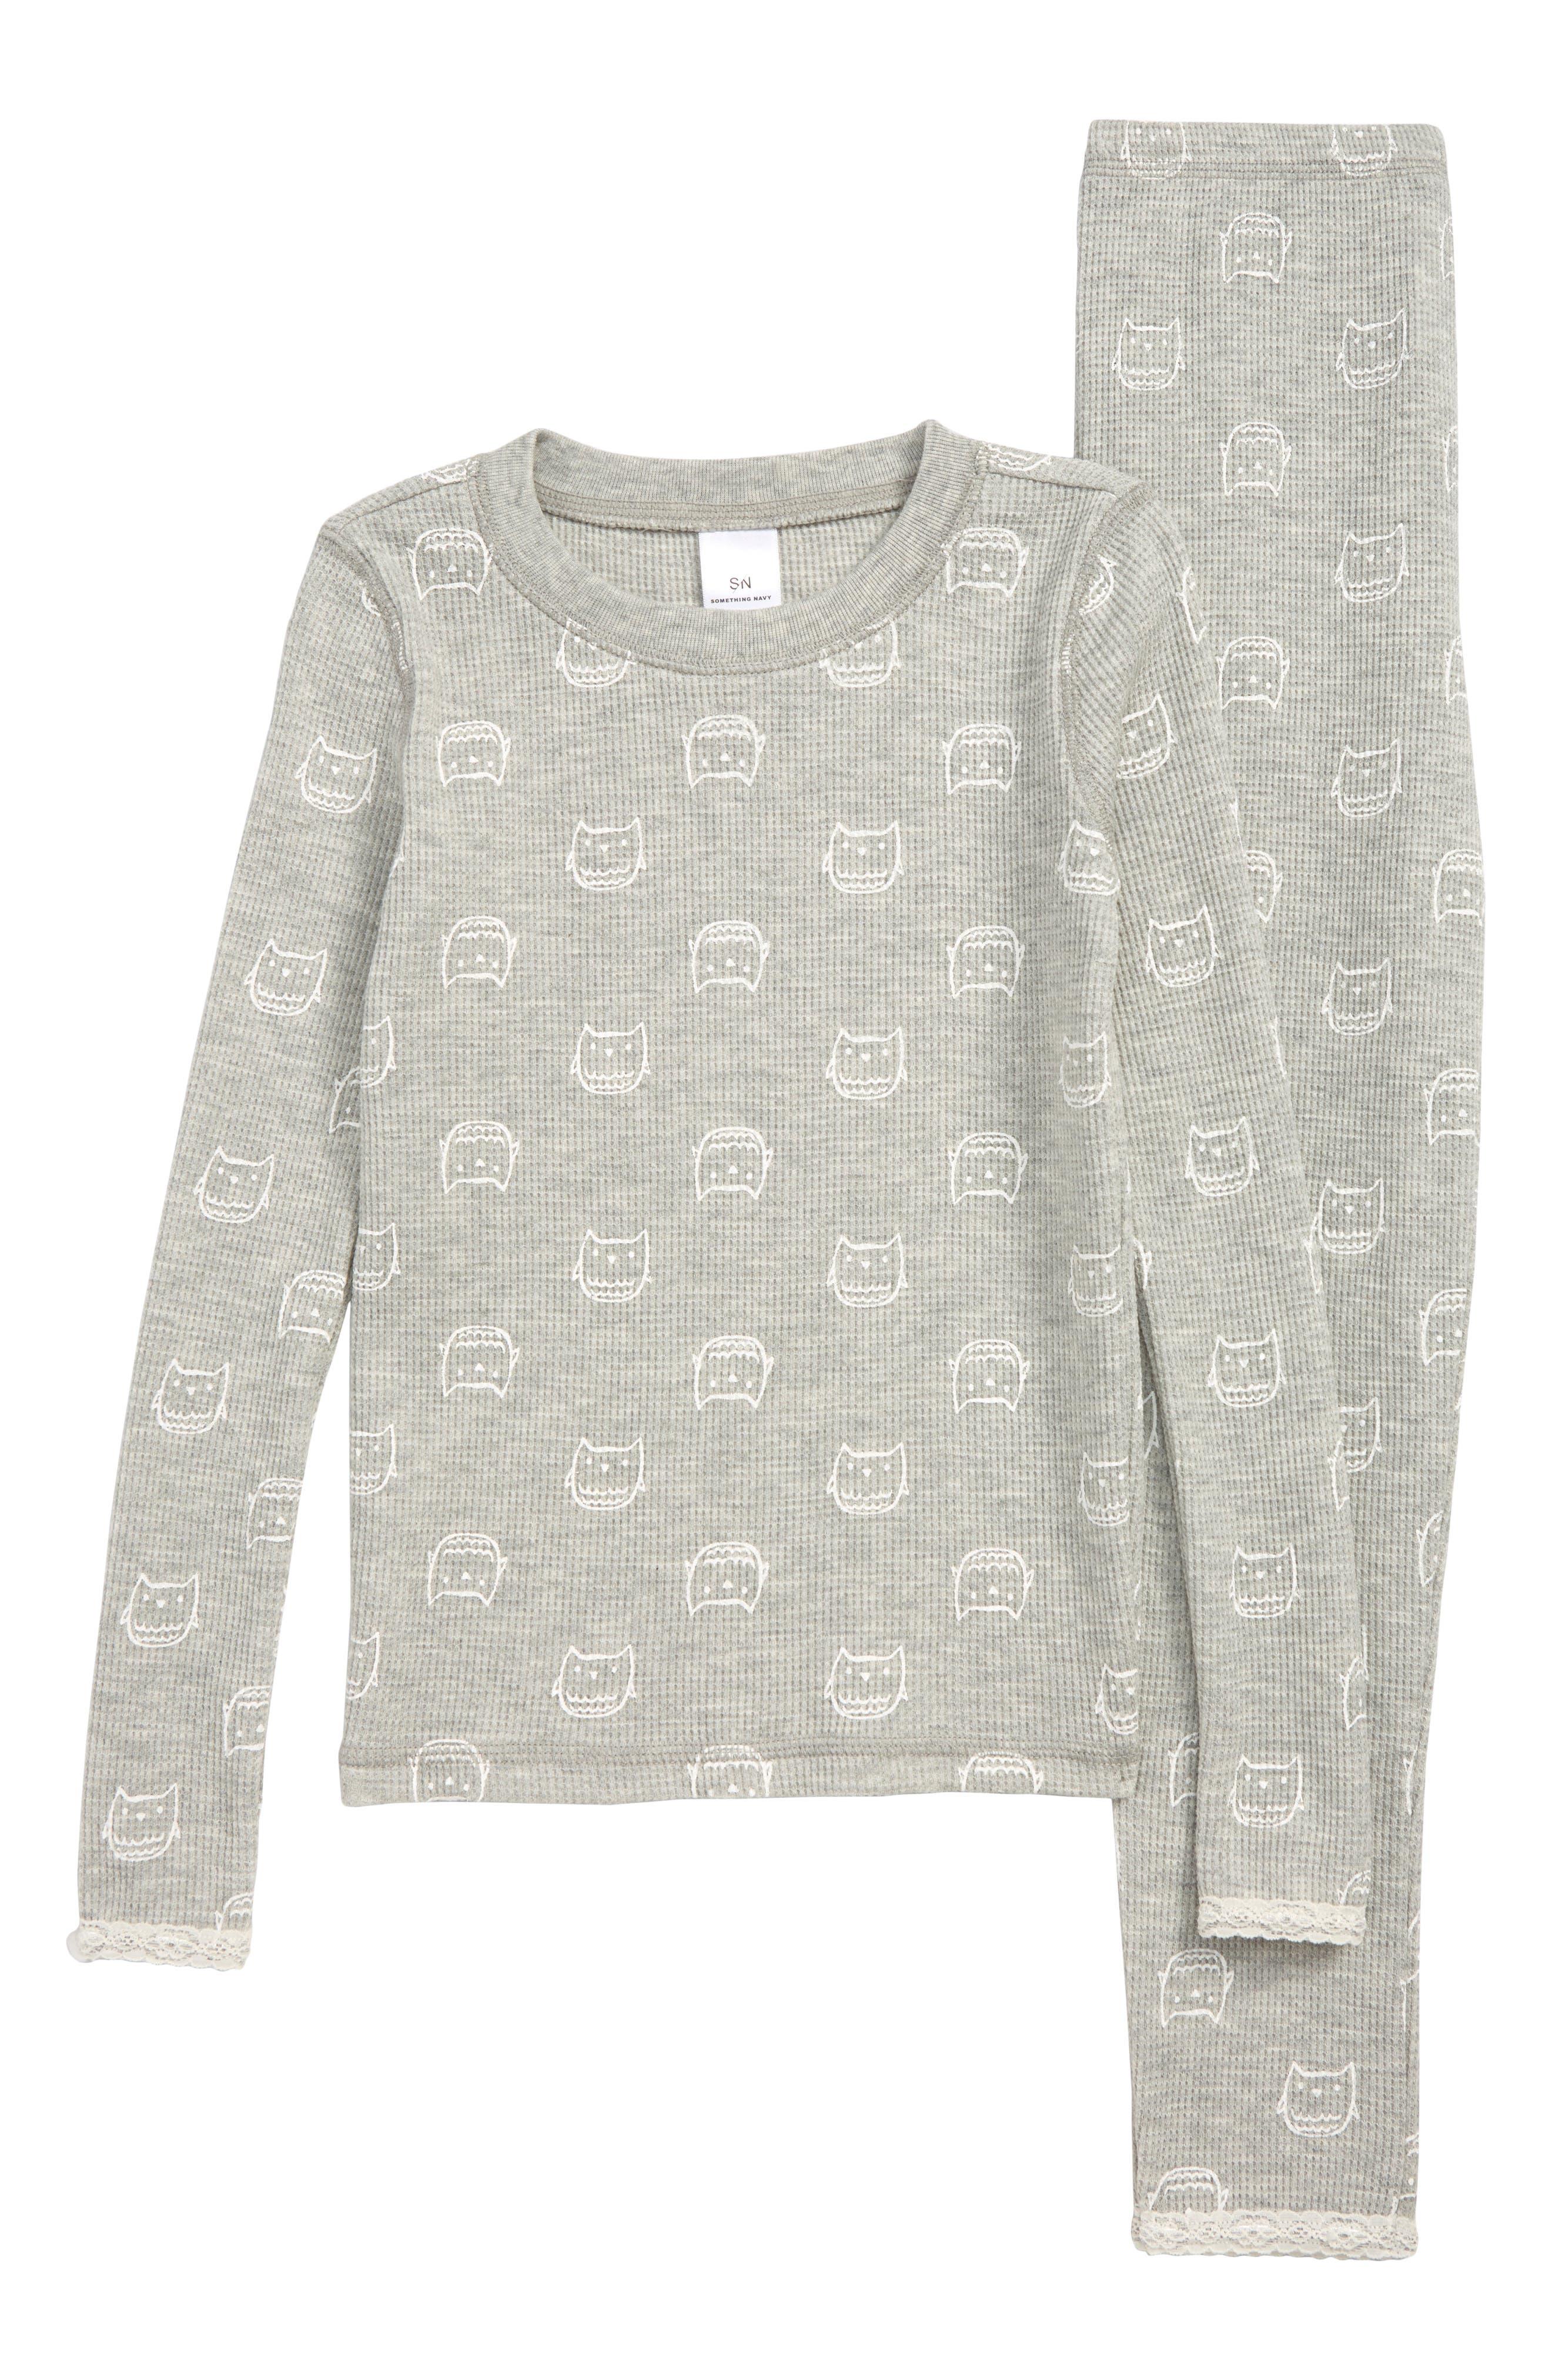 Toddler Girls Something Navy Lace Trim Fitted TwoPiece Pajamas Size 3T  Grey